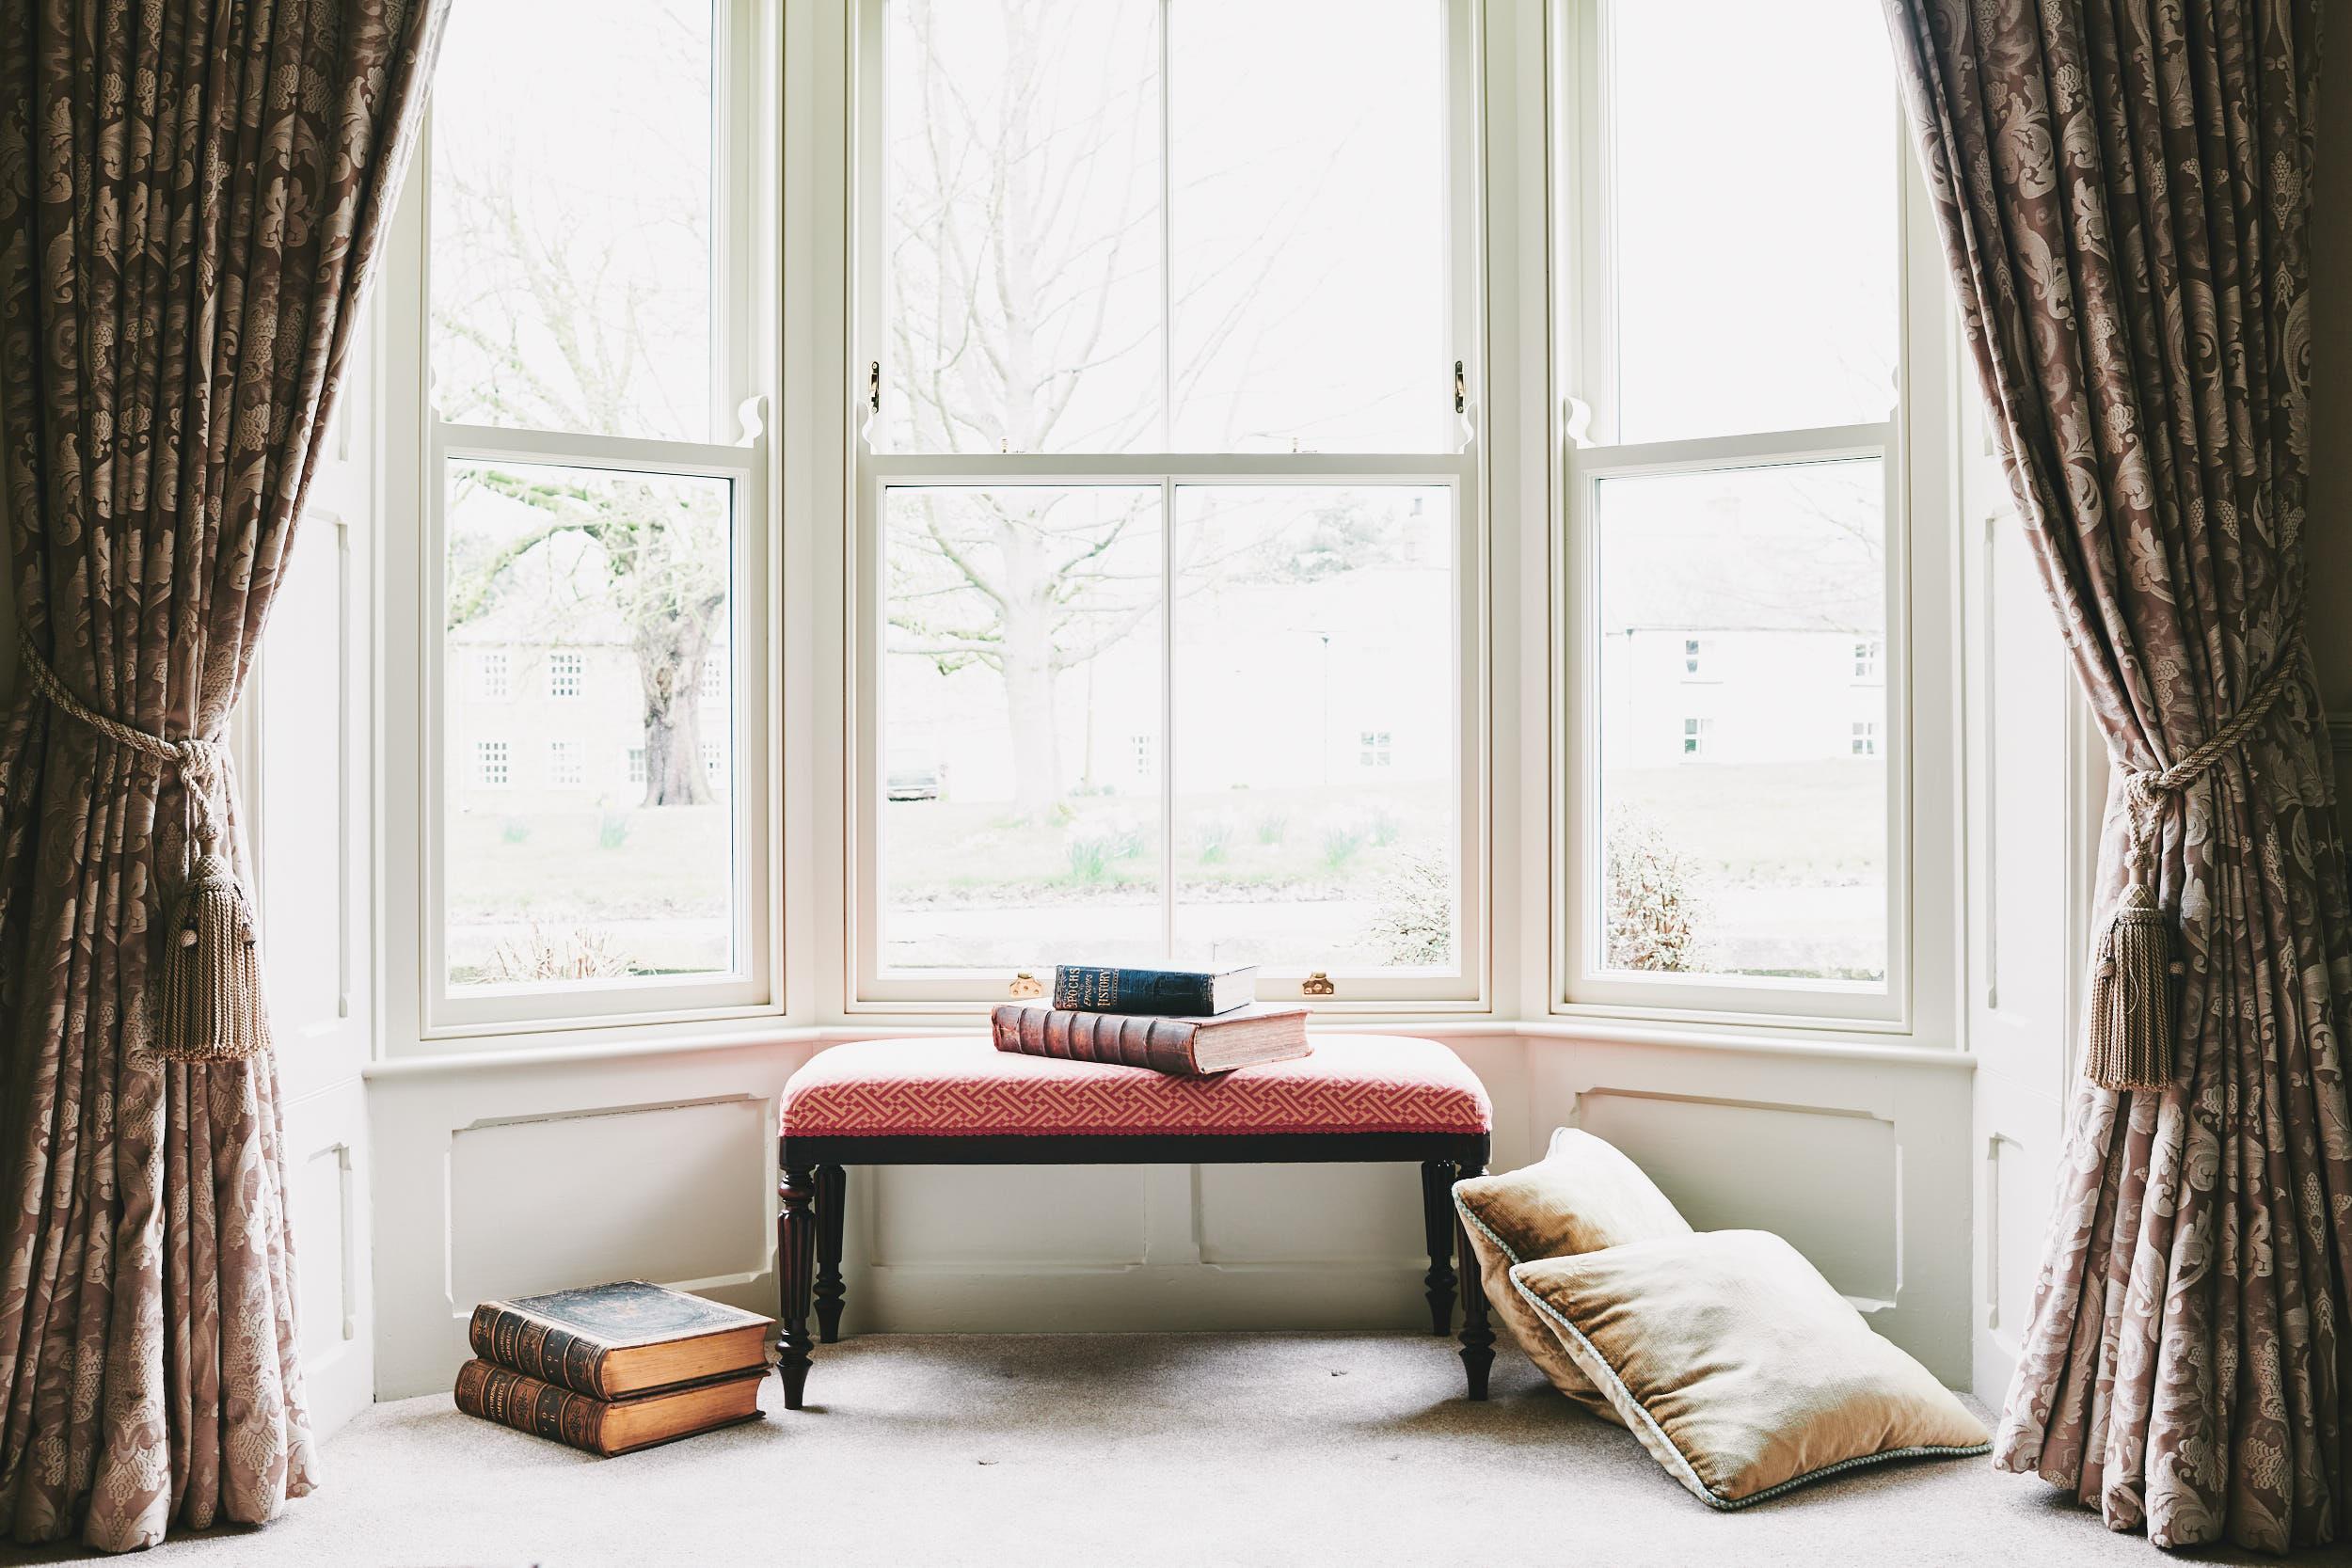 interior photography of luxury bespoke homes by matthew lloyd3167.jpg